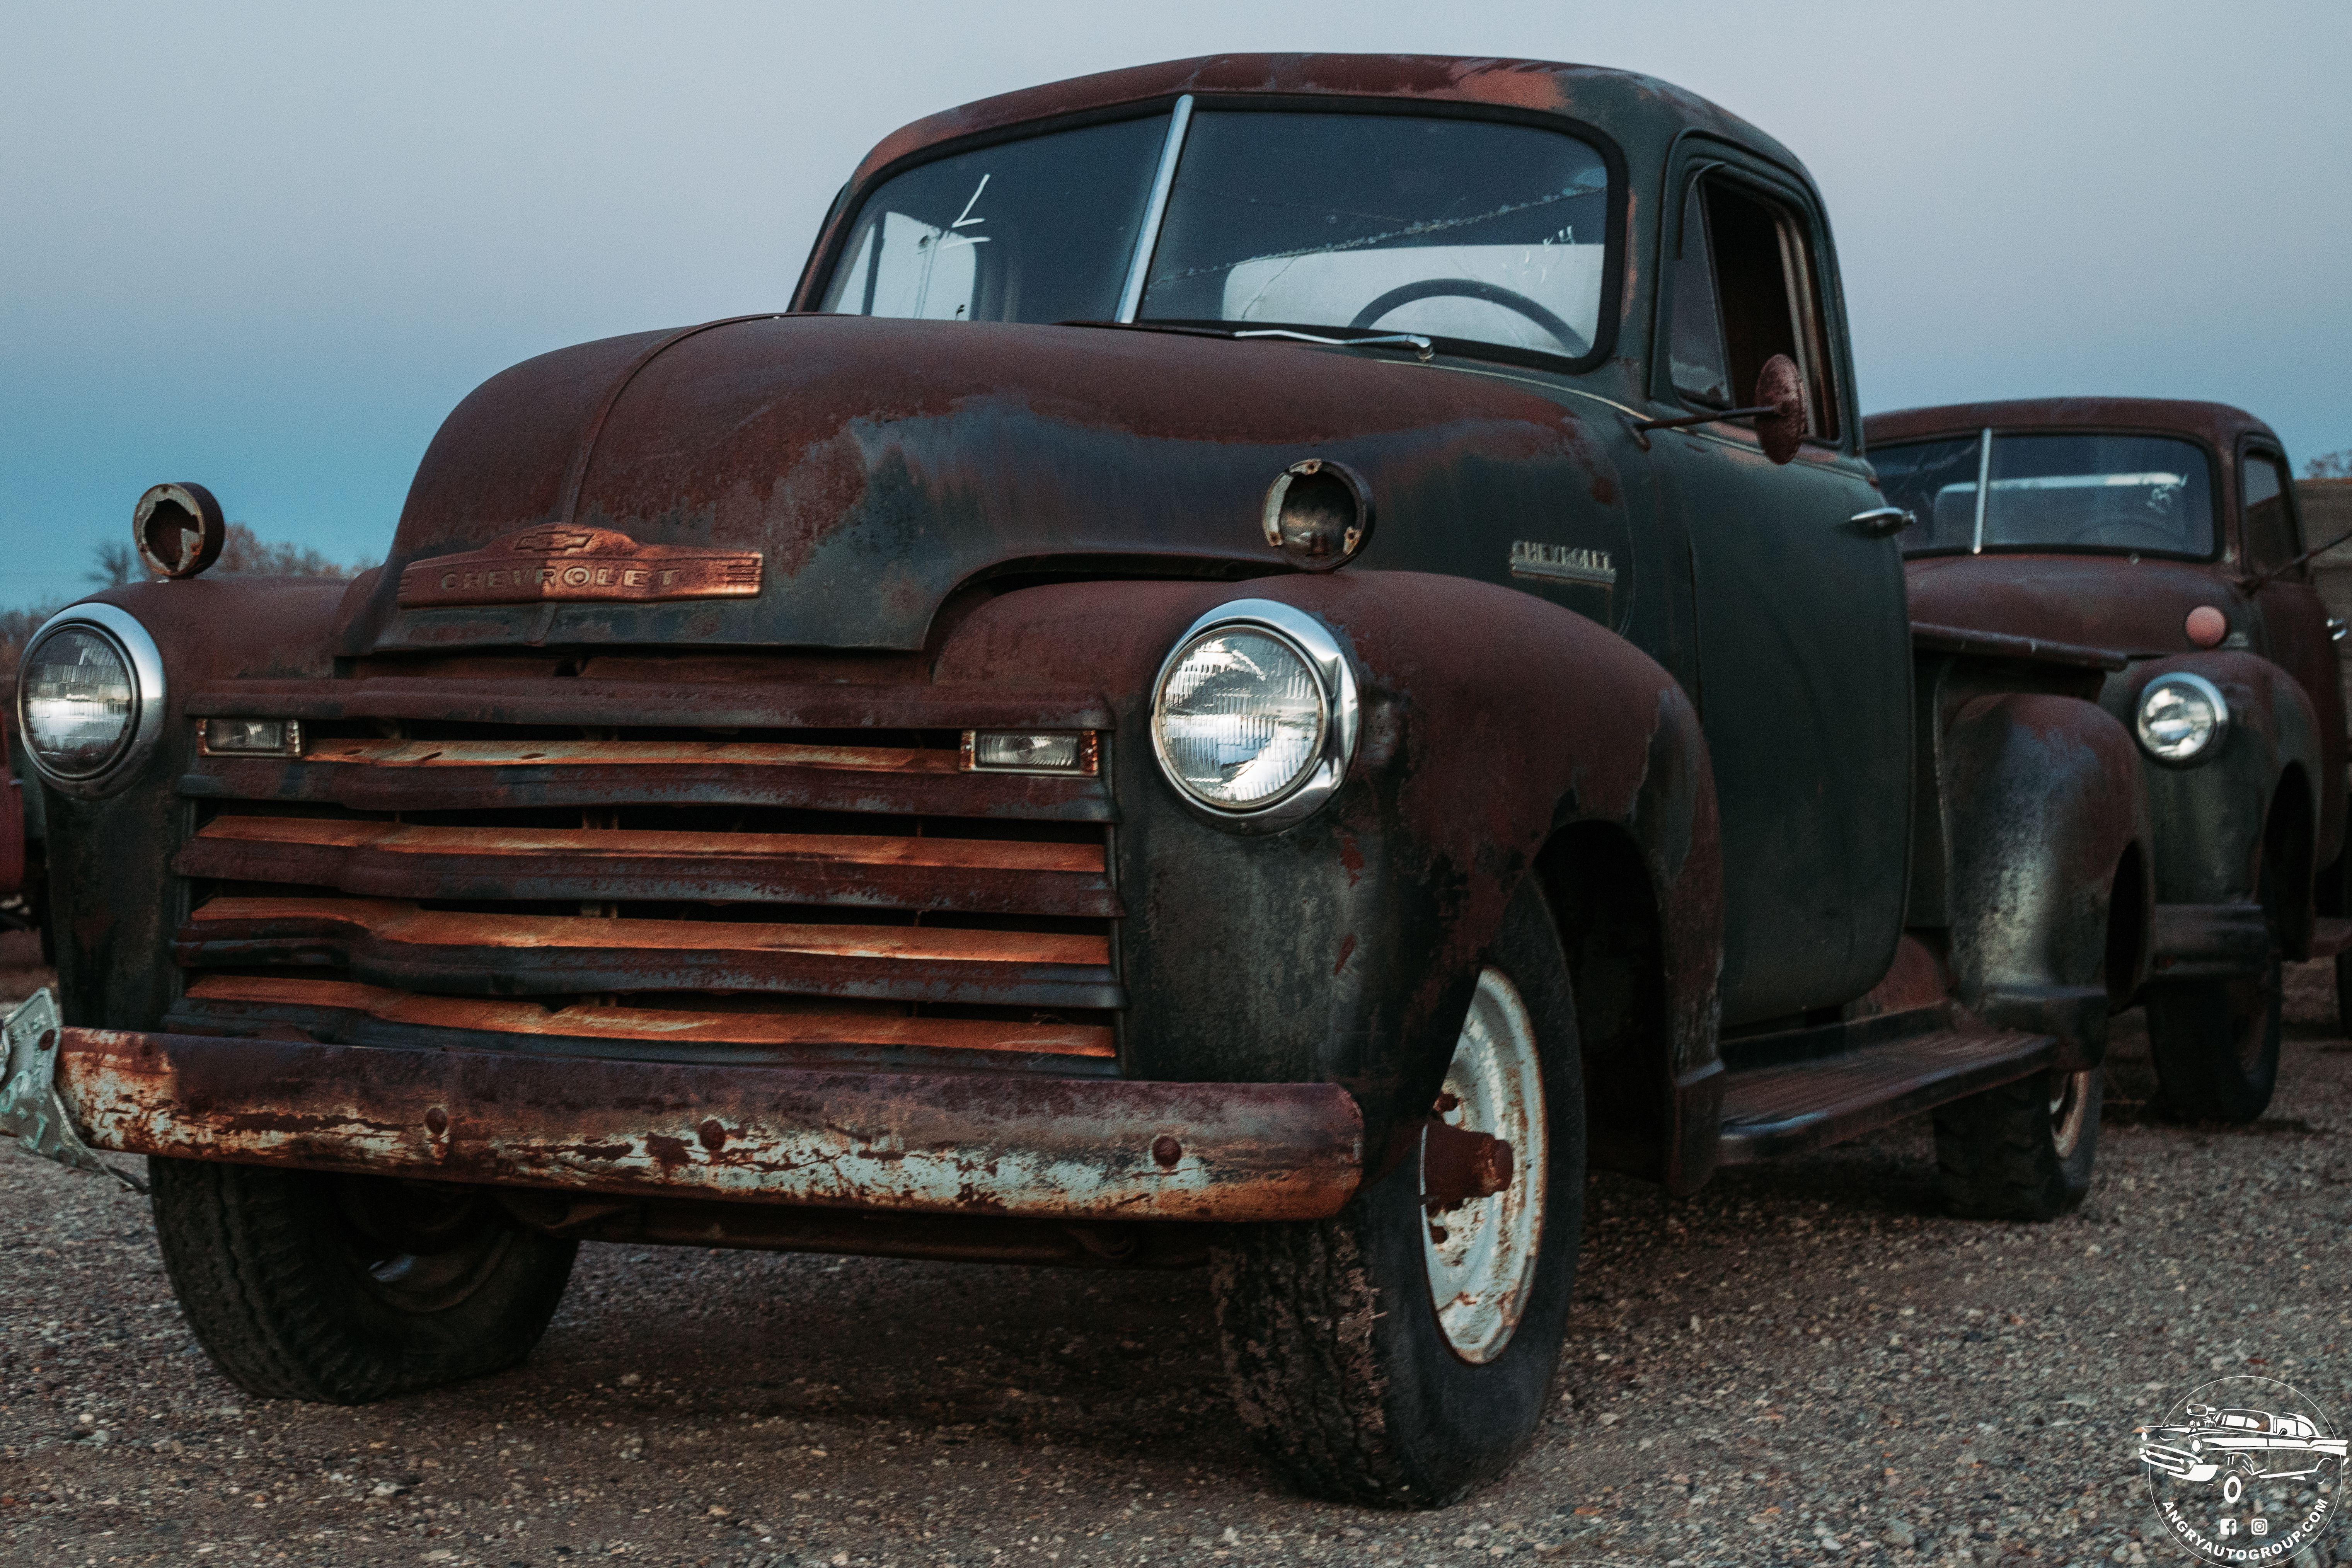 1940s Chevrolet Trucks Chevrolet Trucks Classic Cars Vintage Trucks